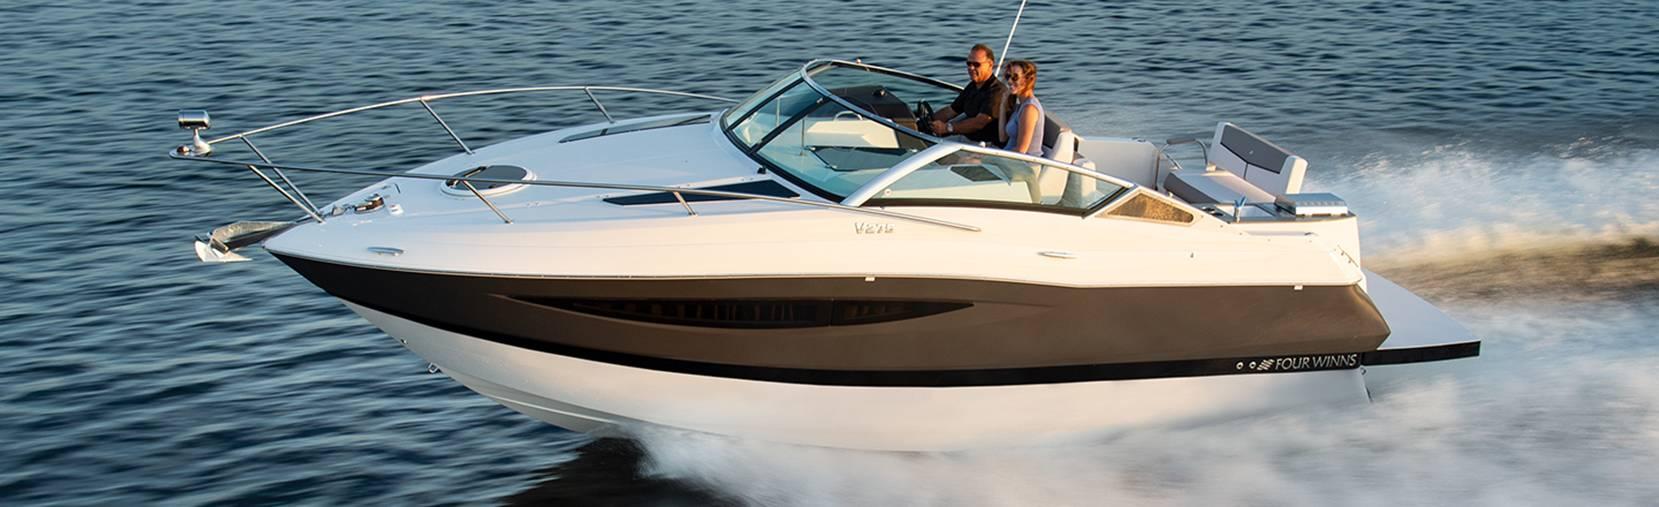 Four Winns Vista 275 boat